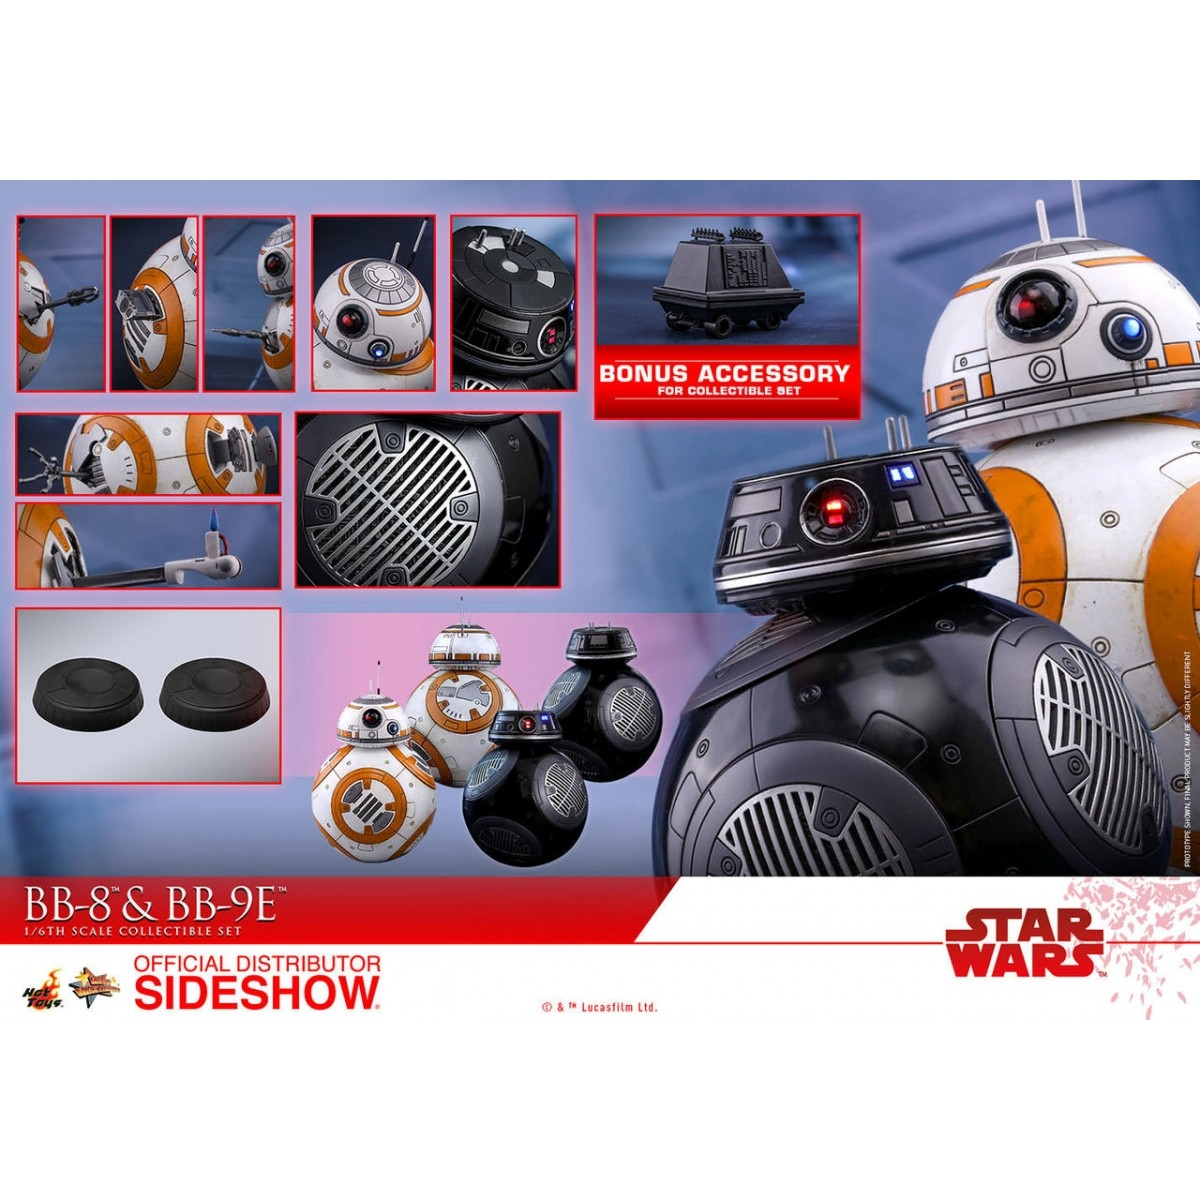 Action Figure BB-8 e BB-9E: Star Wars Os Últimos Jedi (The Last Jedi) Escala 1/6 (MMS442) - Hot Toys